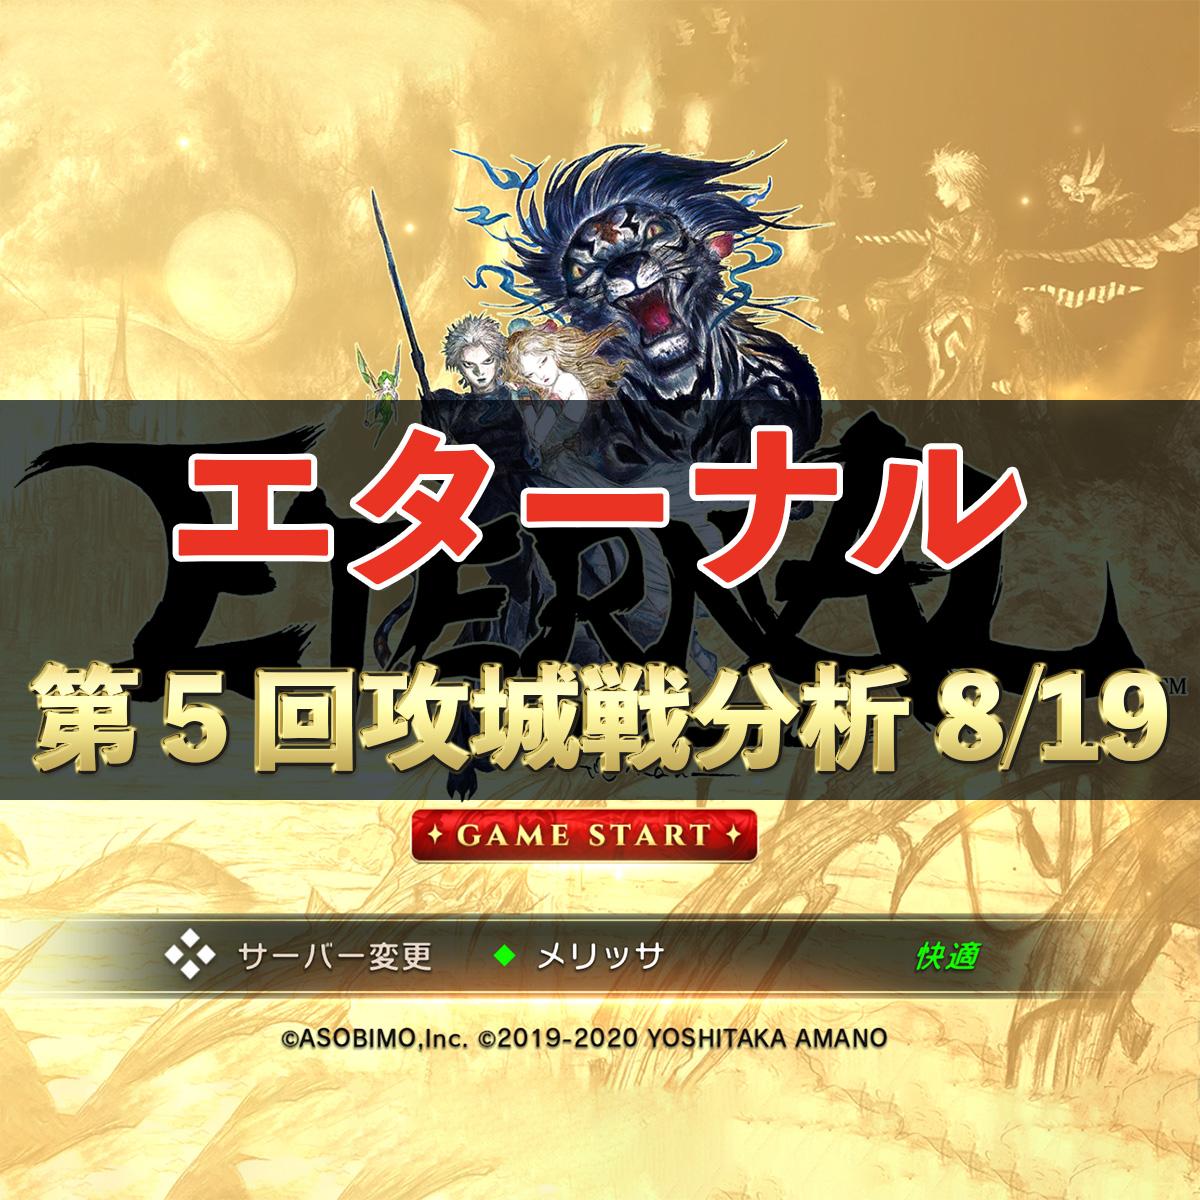 【エターナル】8/19調査! 第五回攻城戦 参加軍団徹底分析!